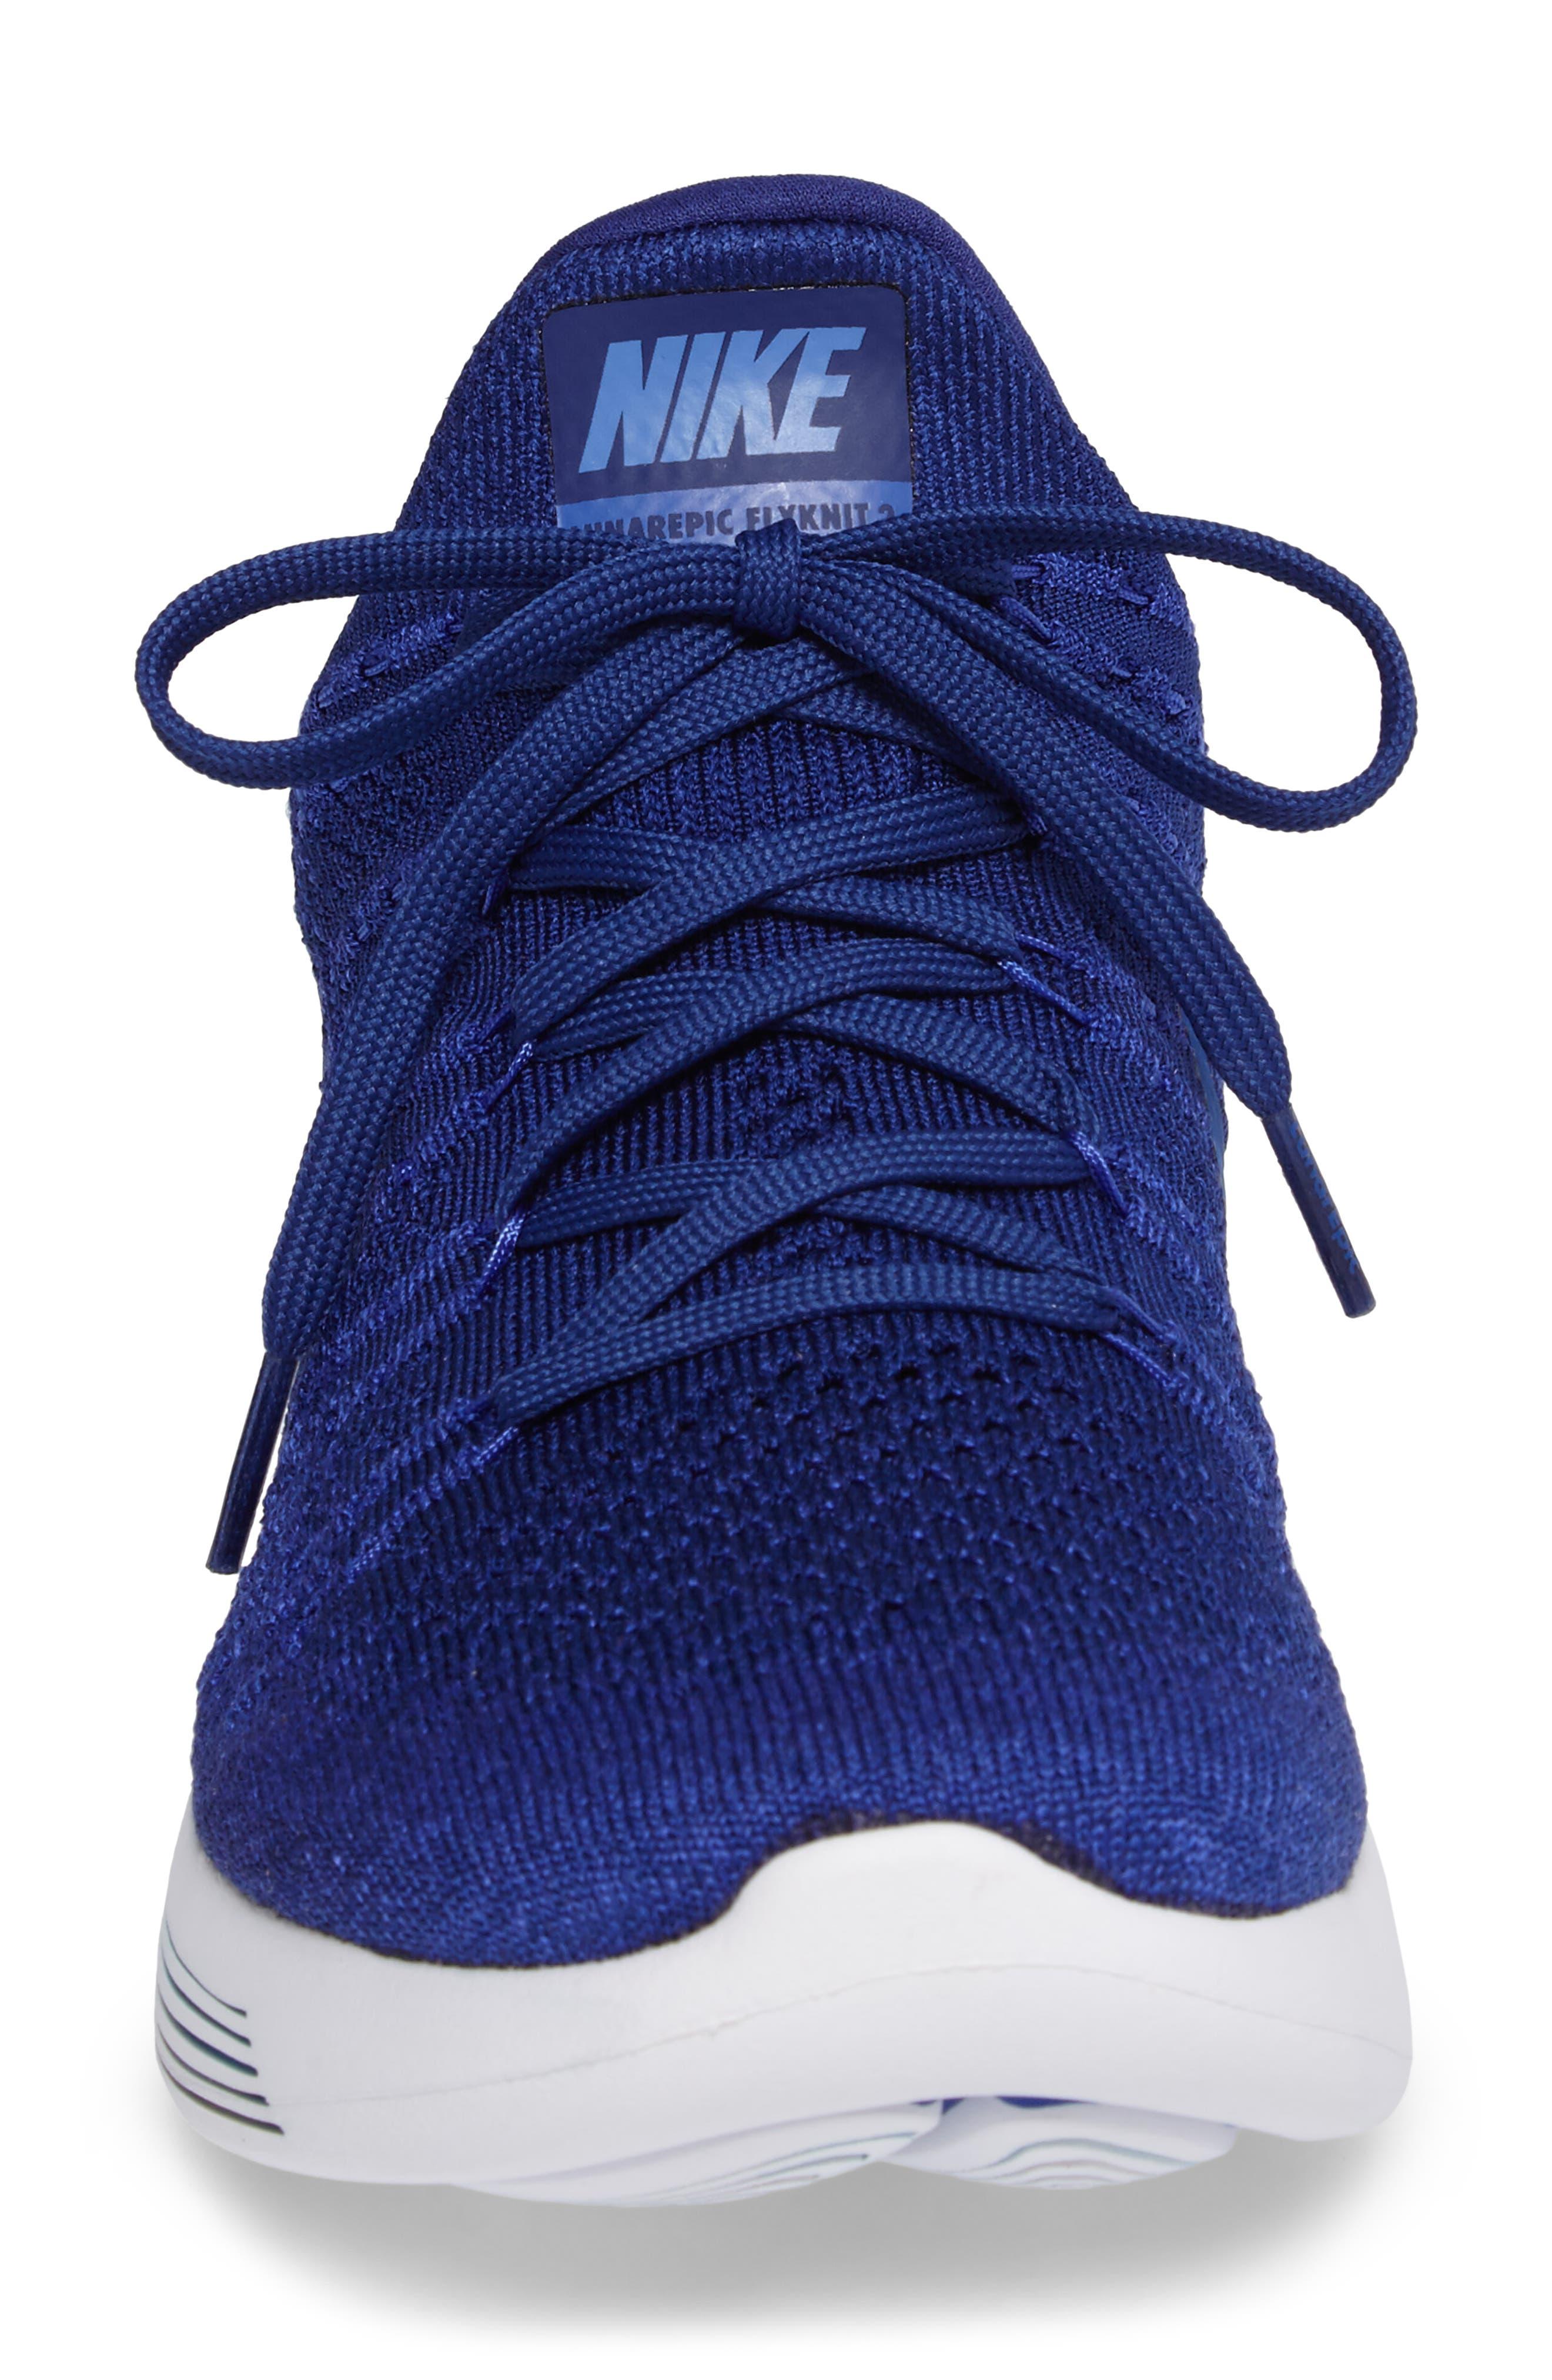 Alternate Image 4  - Nike Flyknit 2 LunarEpic Running Shoe (Men)